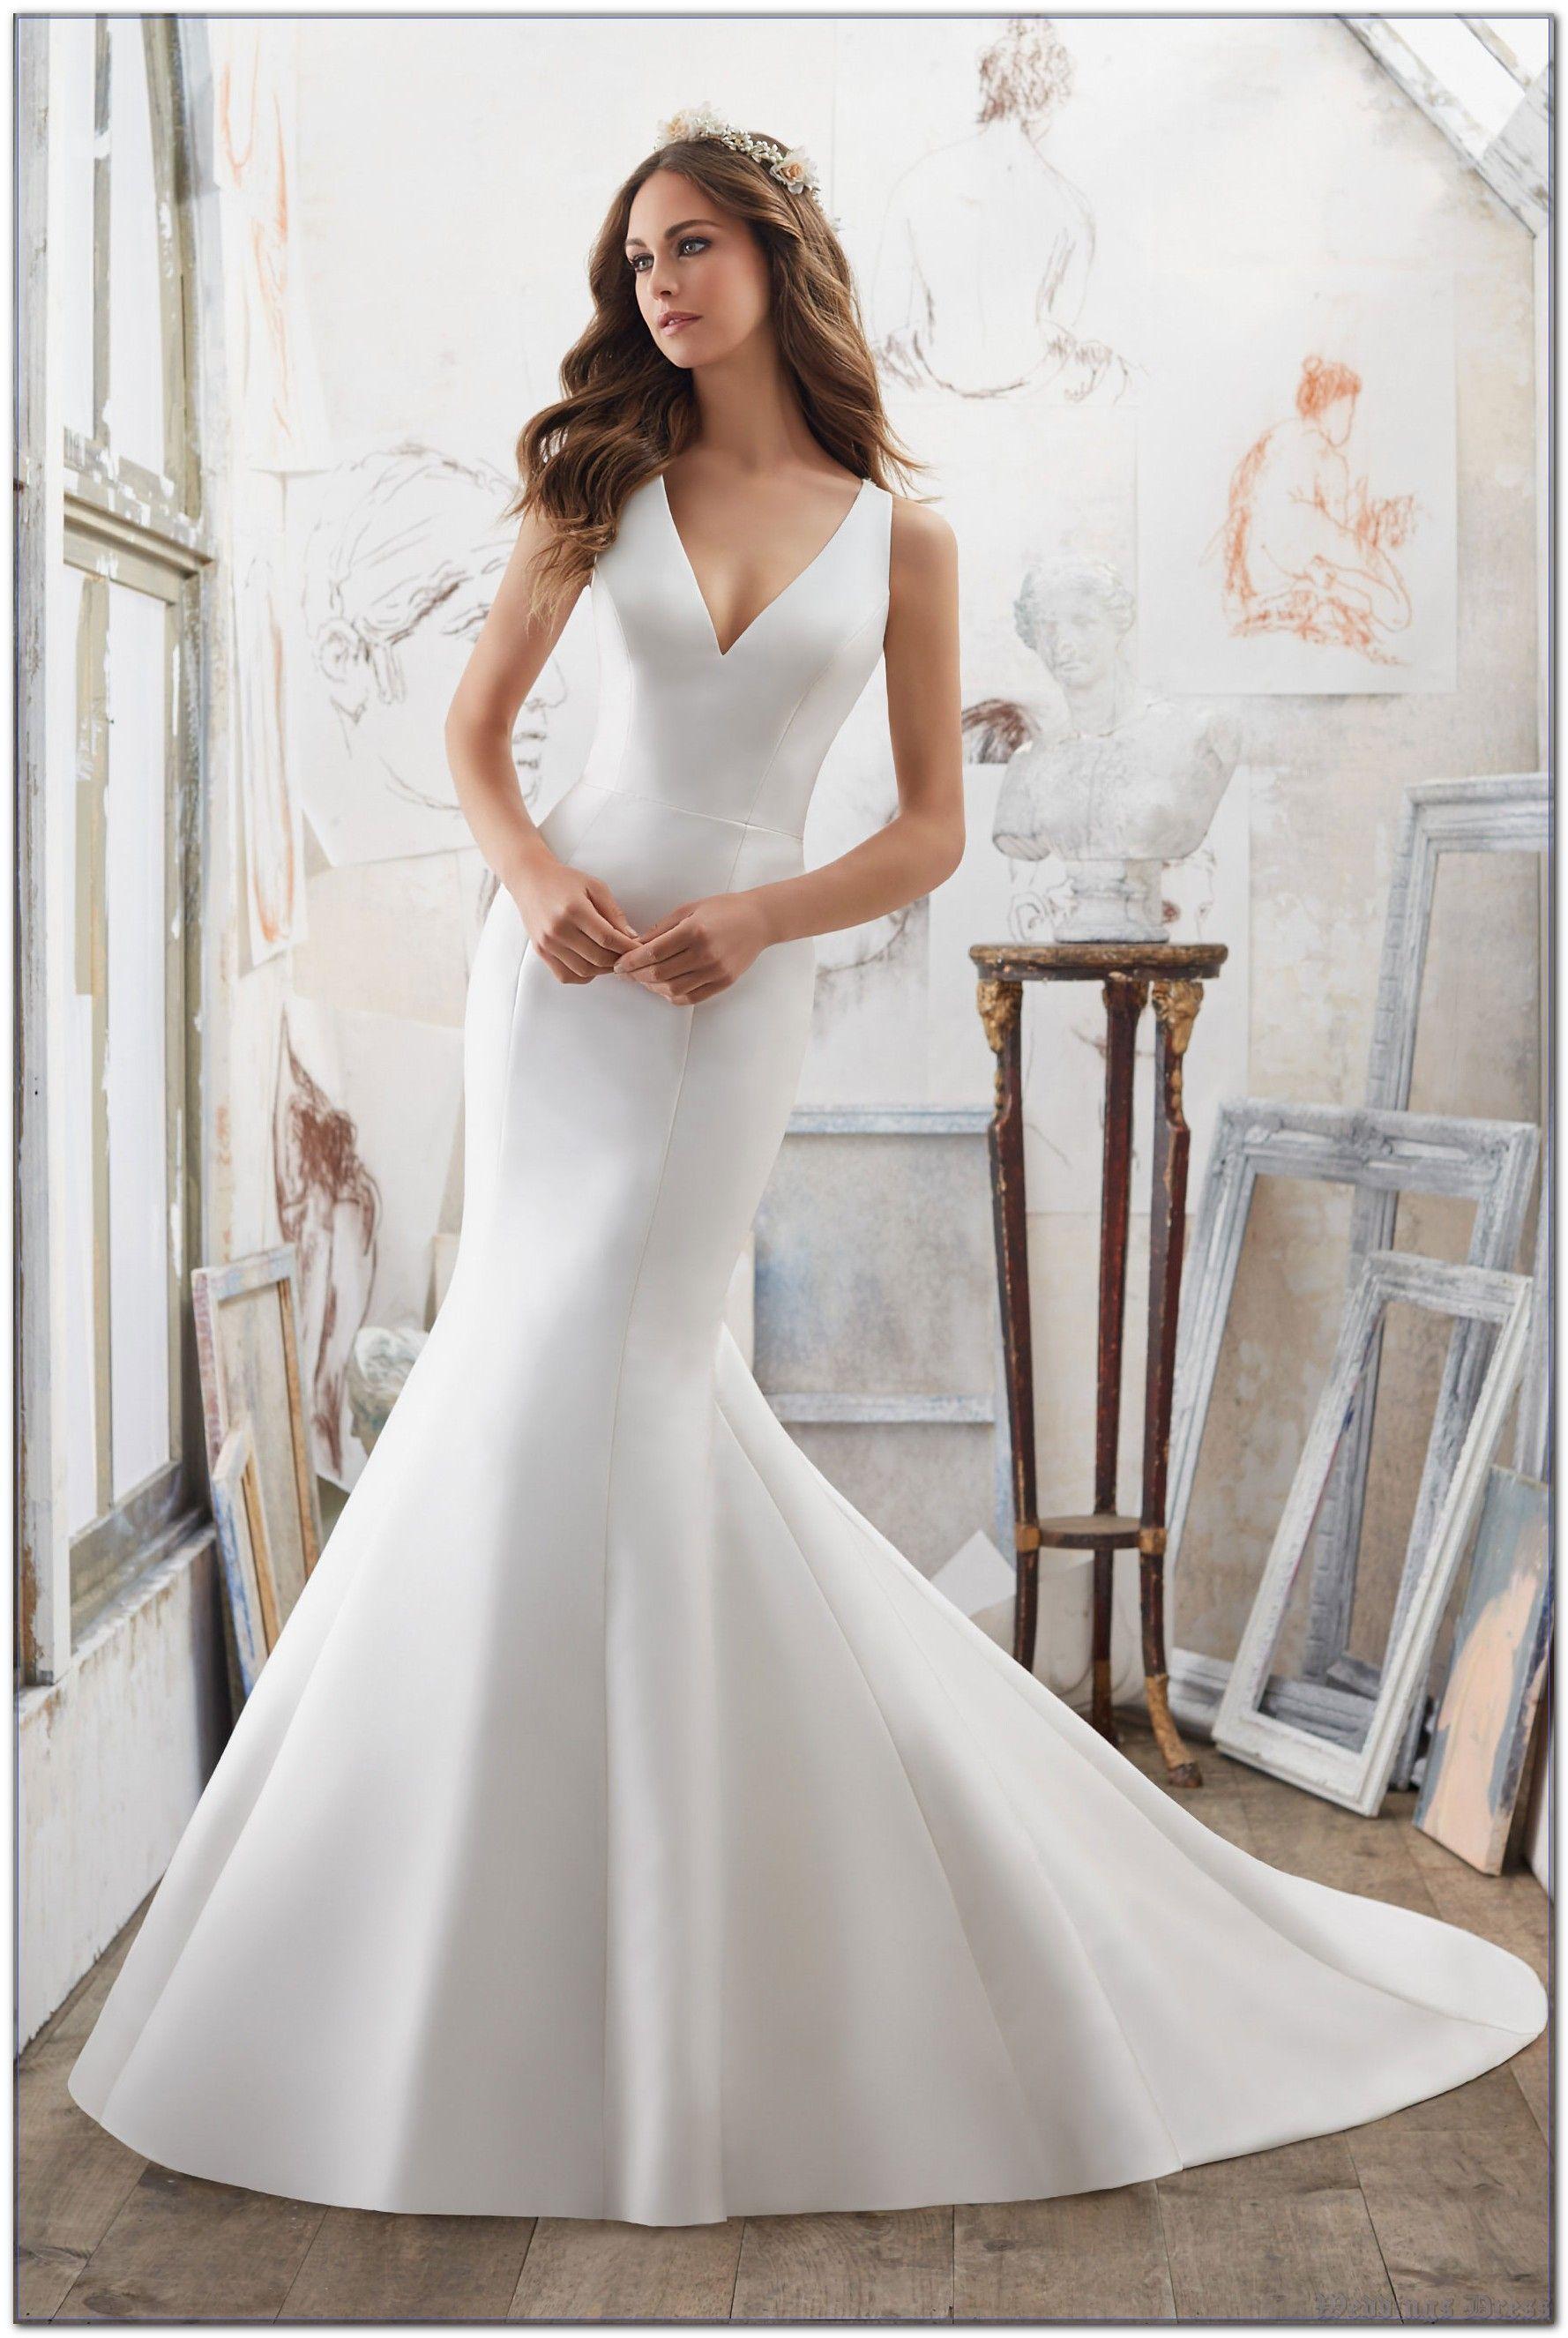 Weddings Dress: What A Mistake!